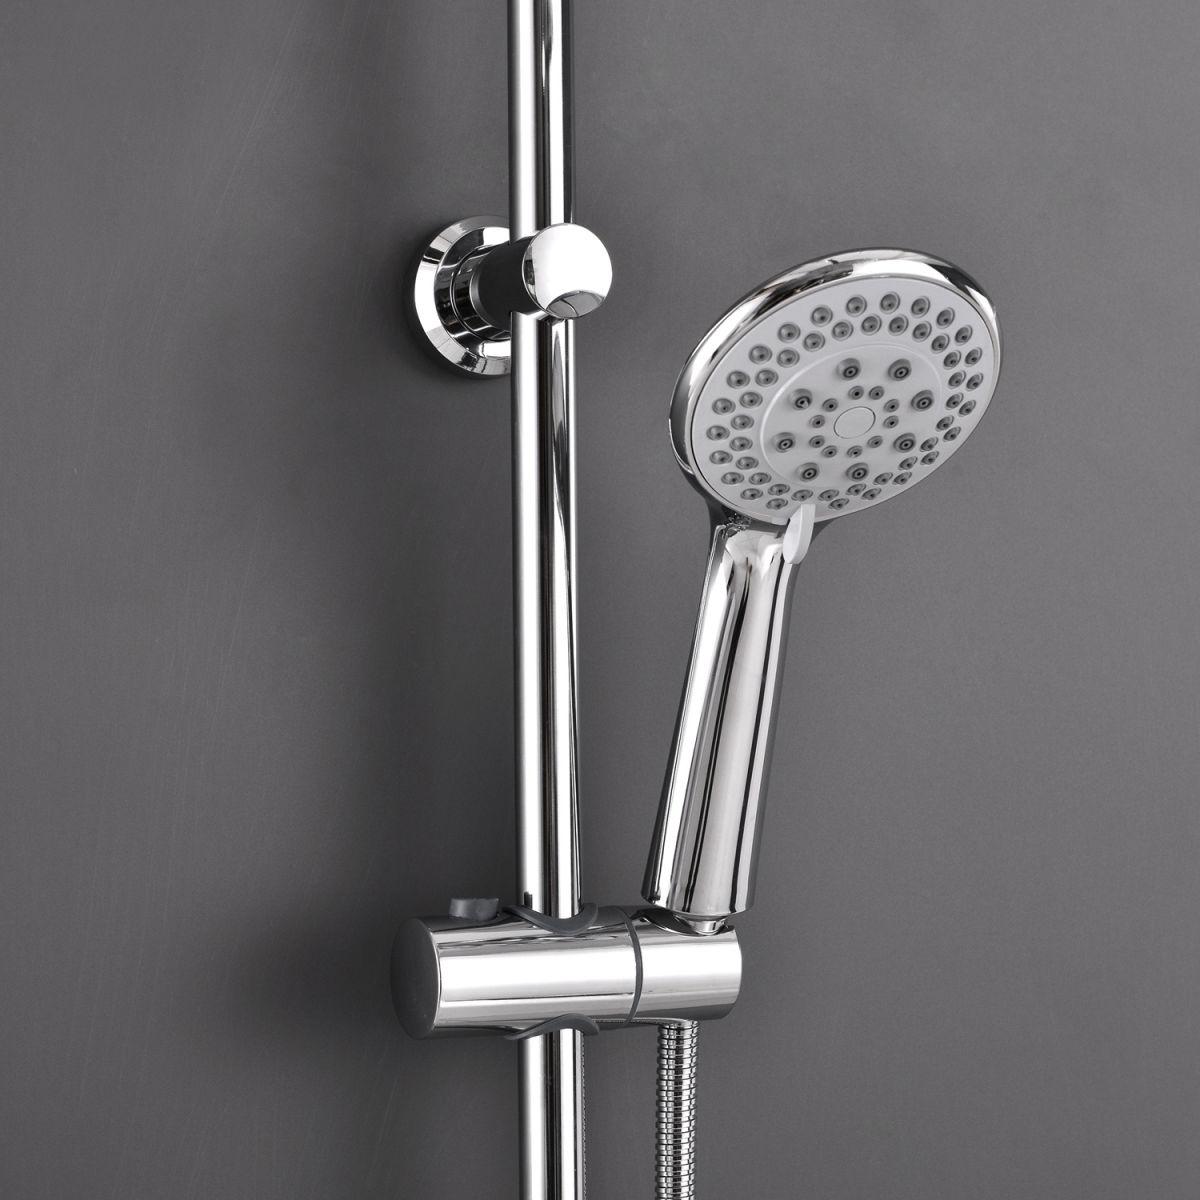 SS 14 3 Colonna doccia